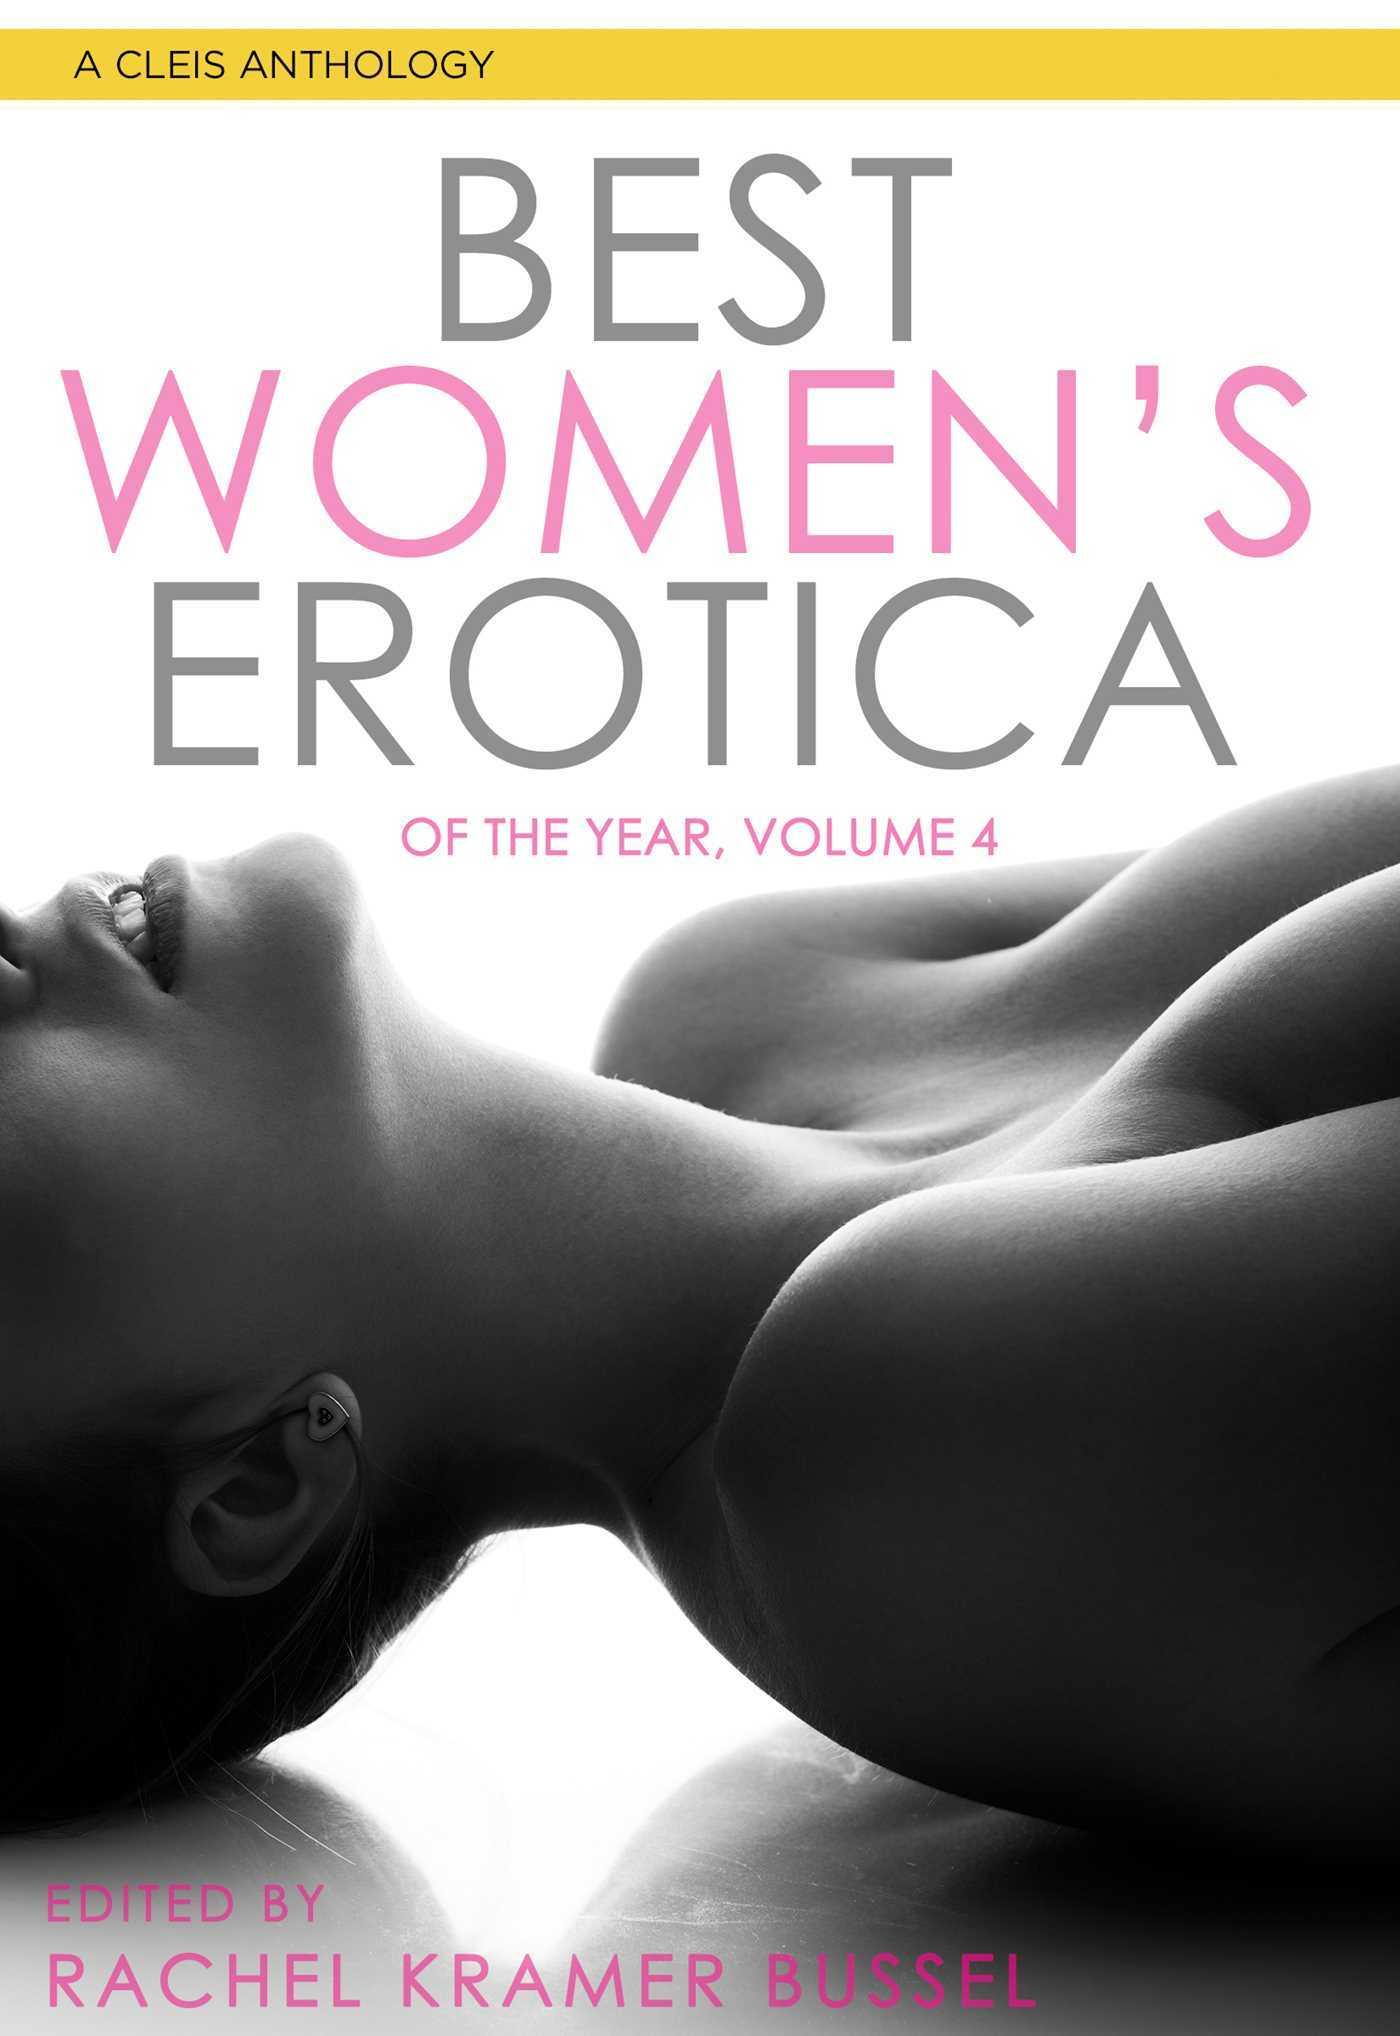 Best Women's Erotica of the Year Volume 4